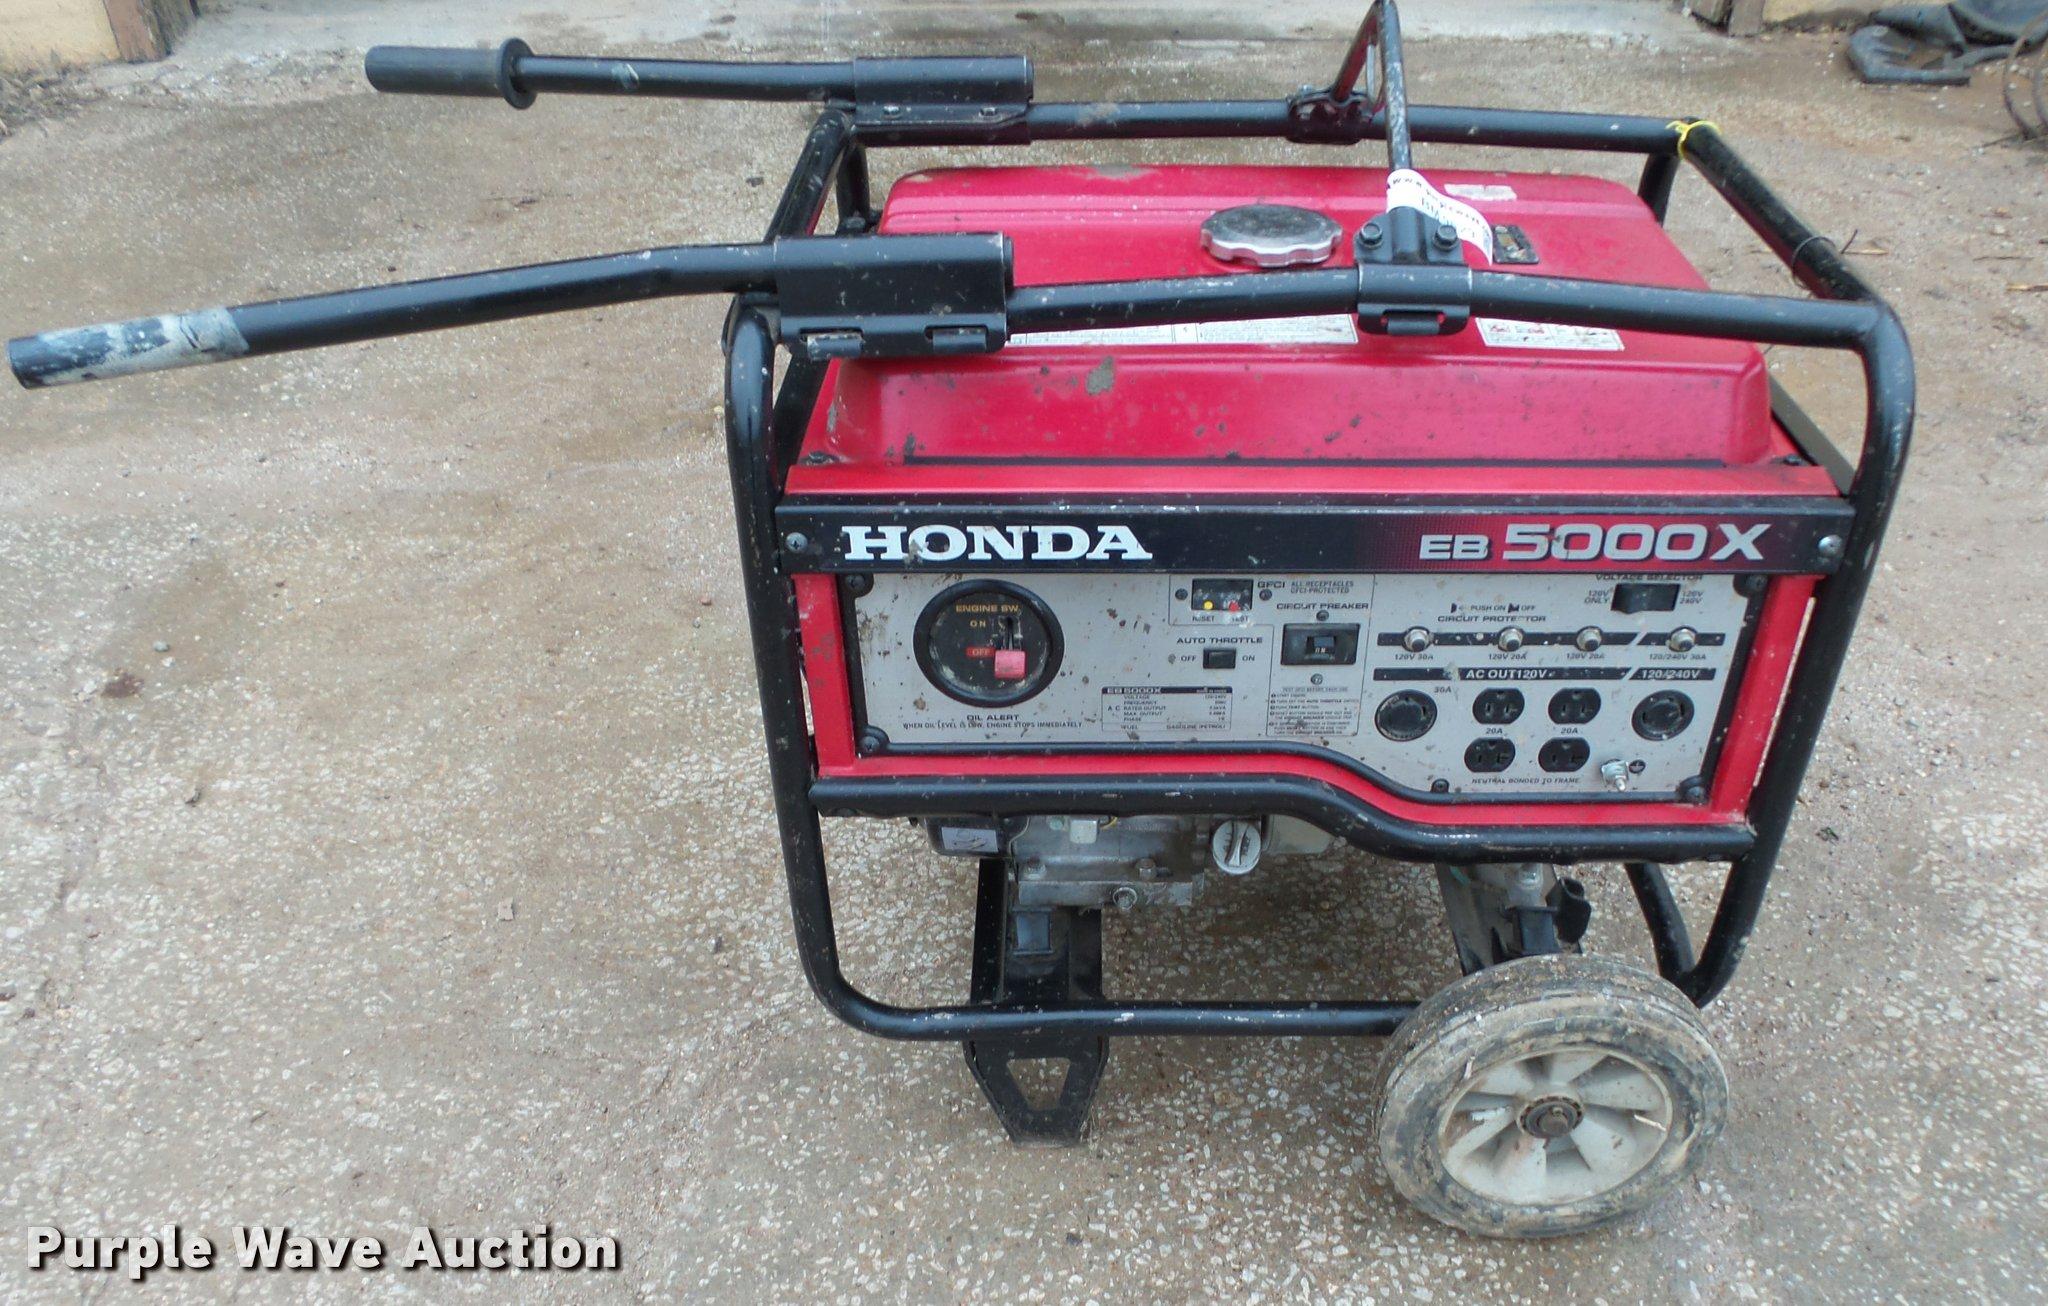 Honda Eb5000x Generator Parts List Diagram Of Eg5000x Ar Jpn Vin Ea7 Bm9529 Image For Item